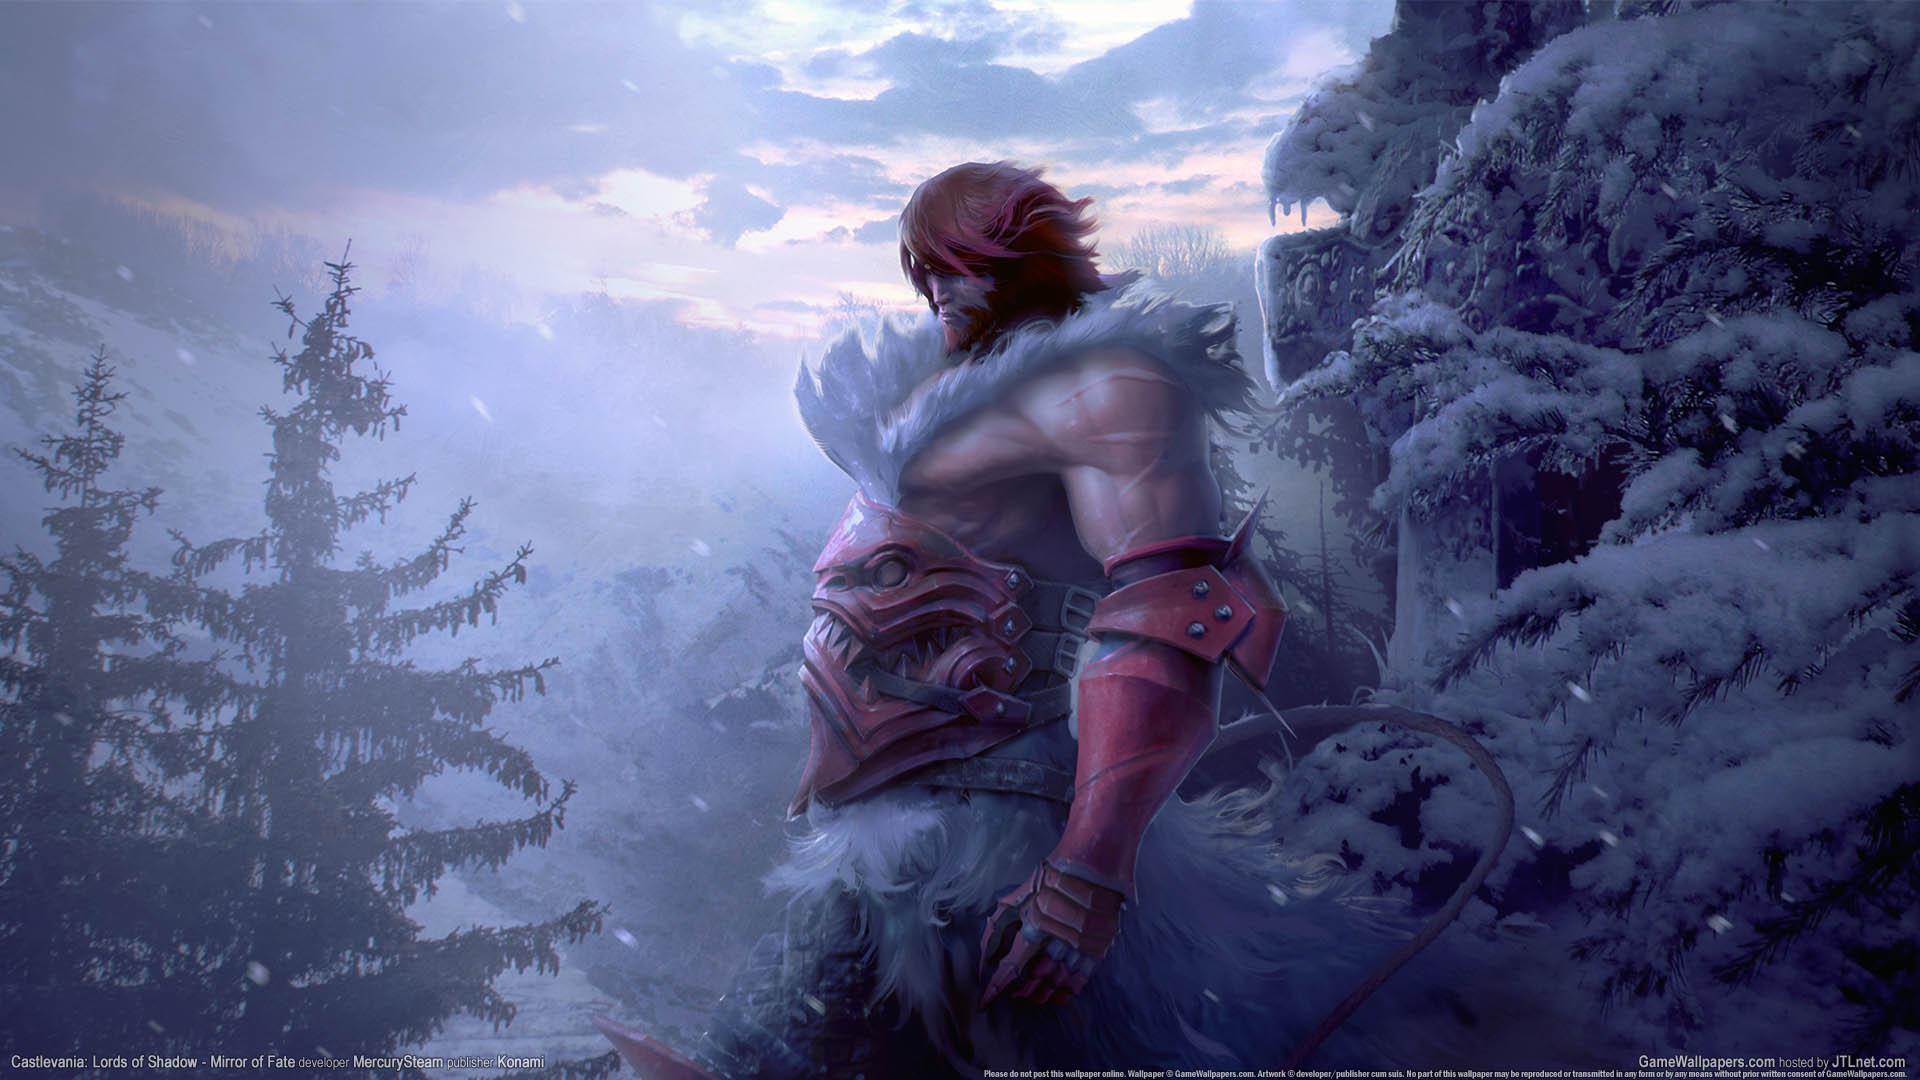 Castlevania: Lords of Shadow - Mirror of Fate Hintergrundbild 03 1920x1080